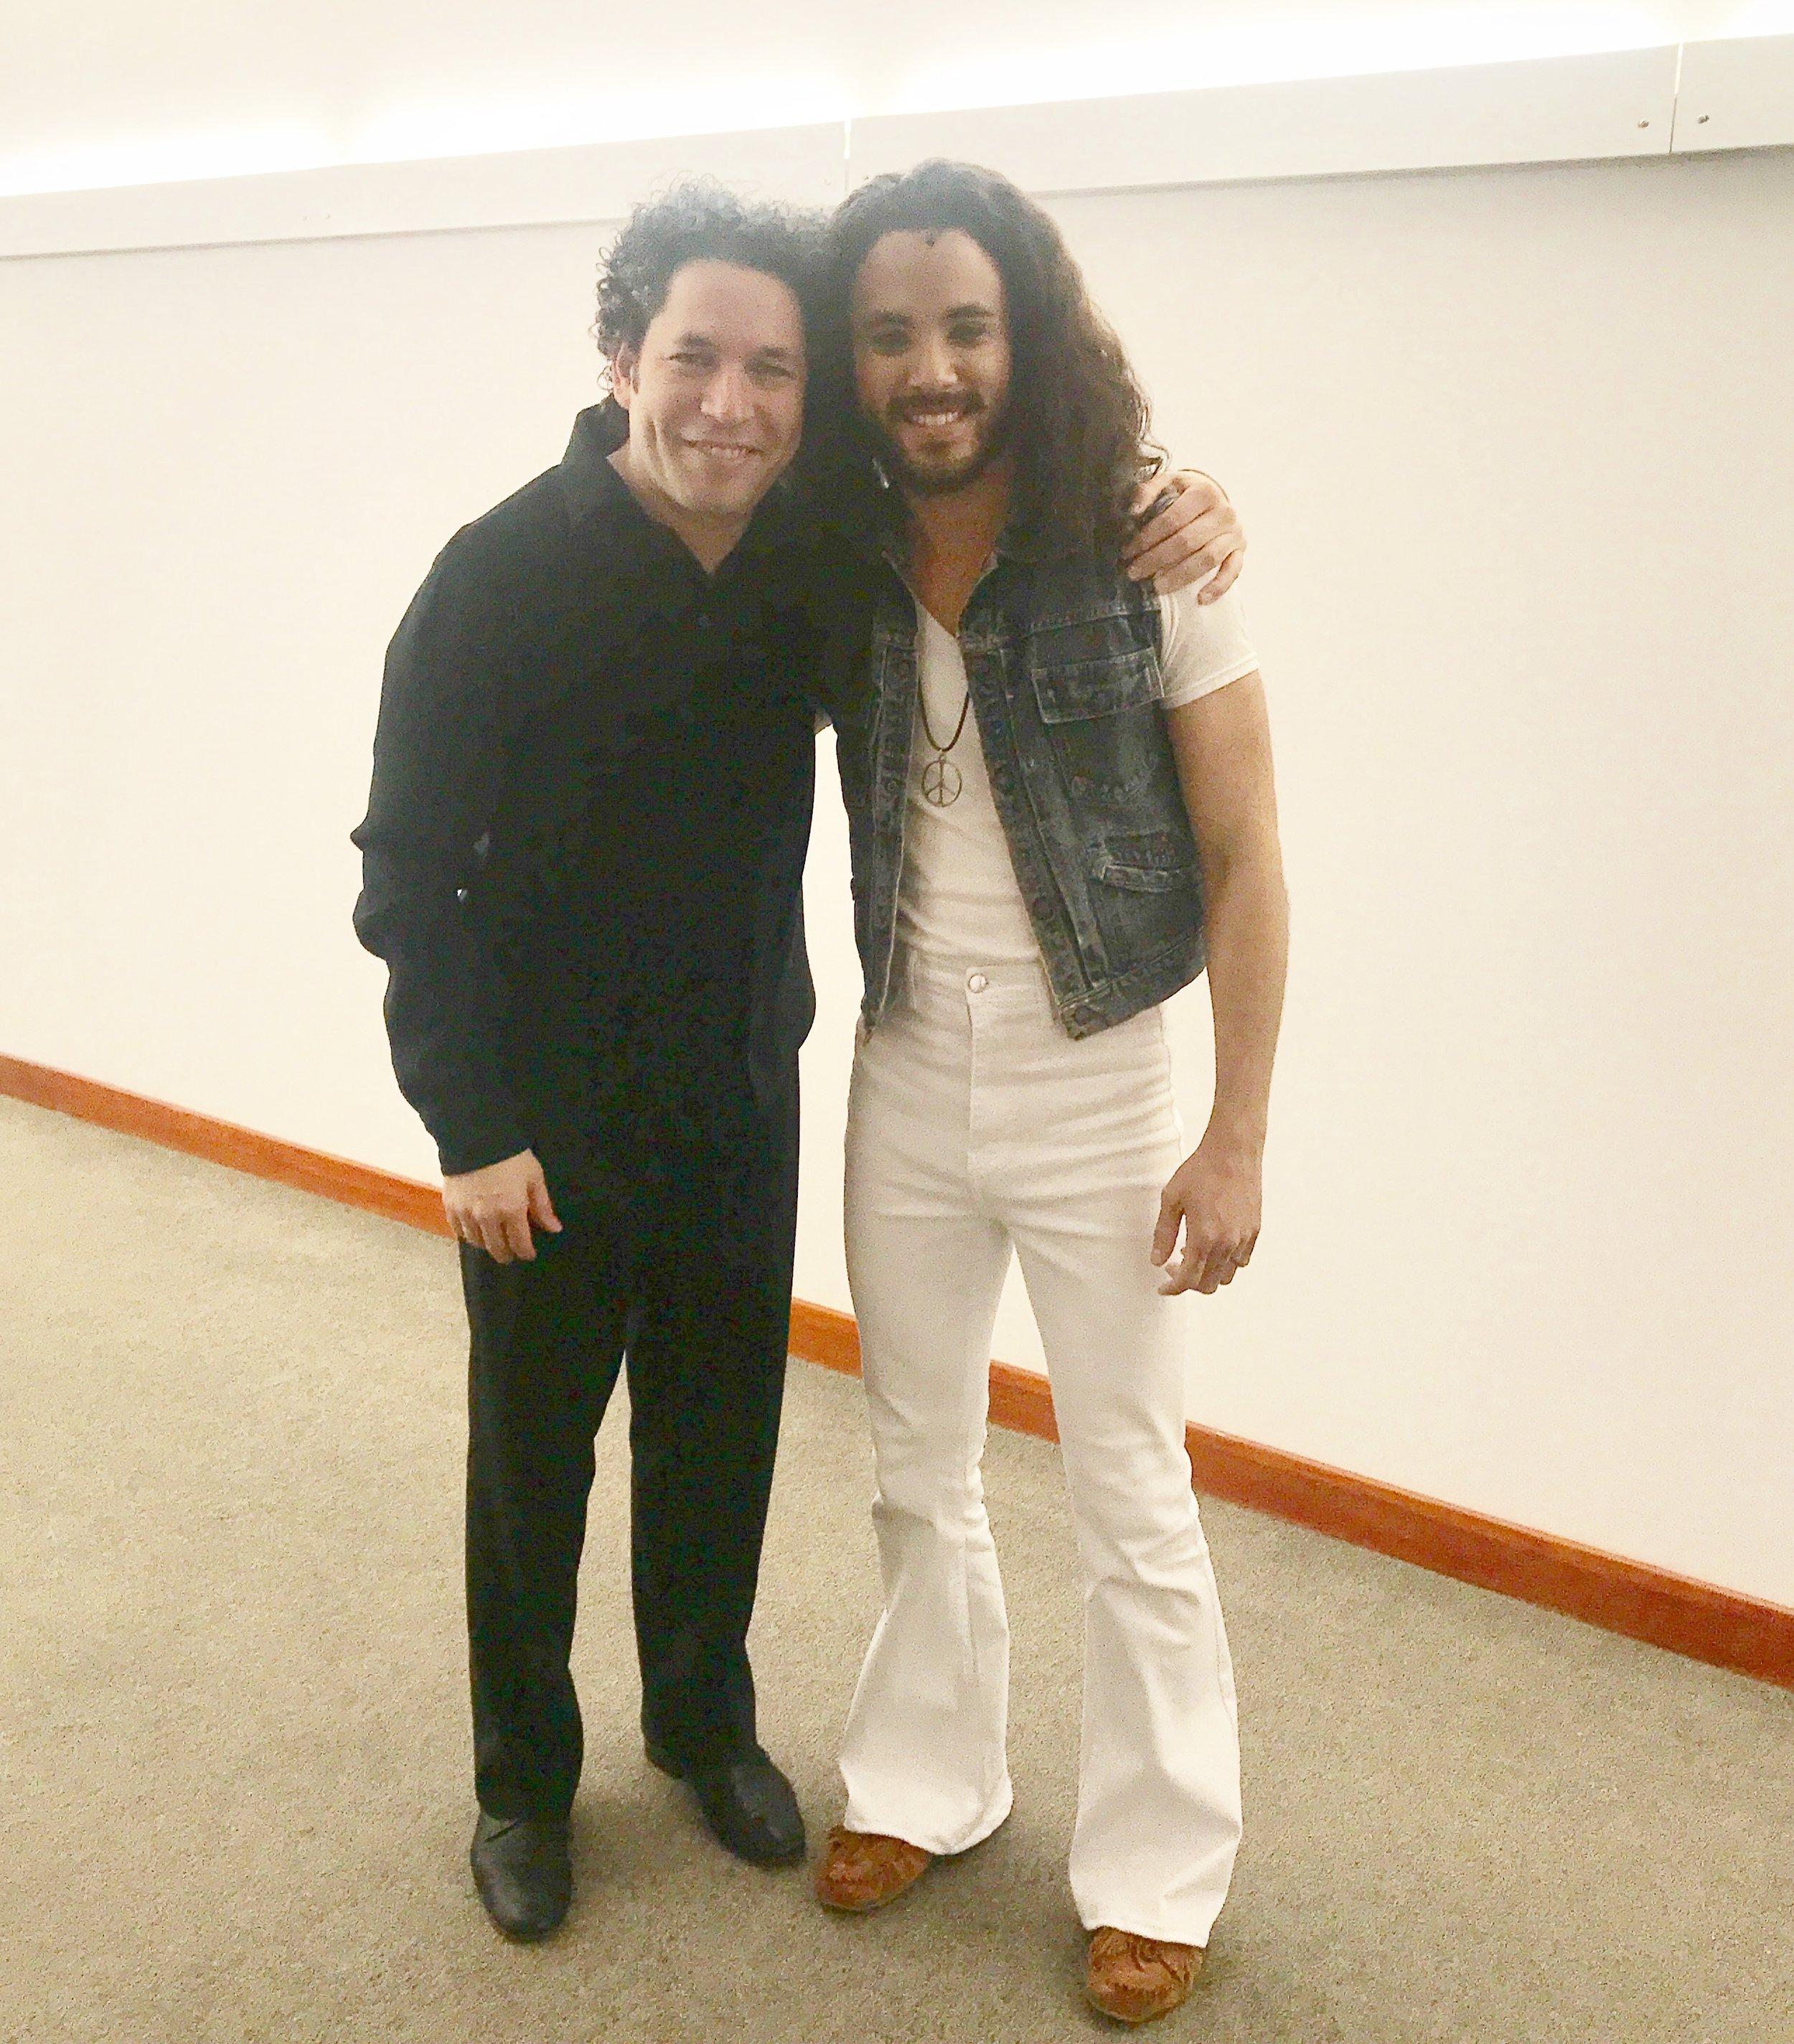 Gustavo and David